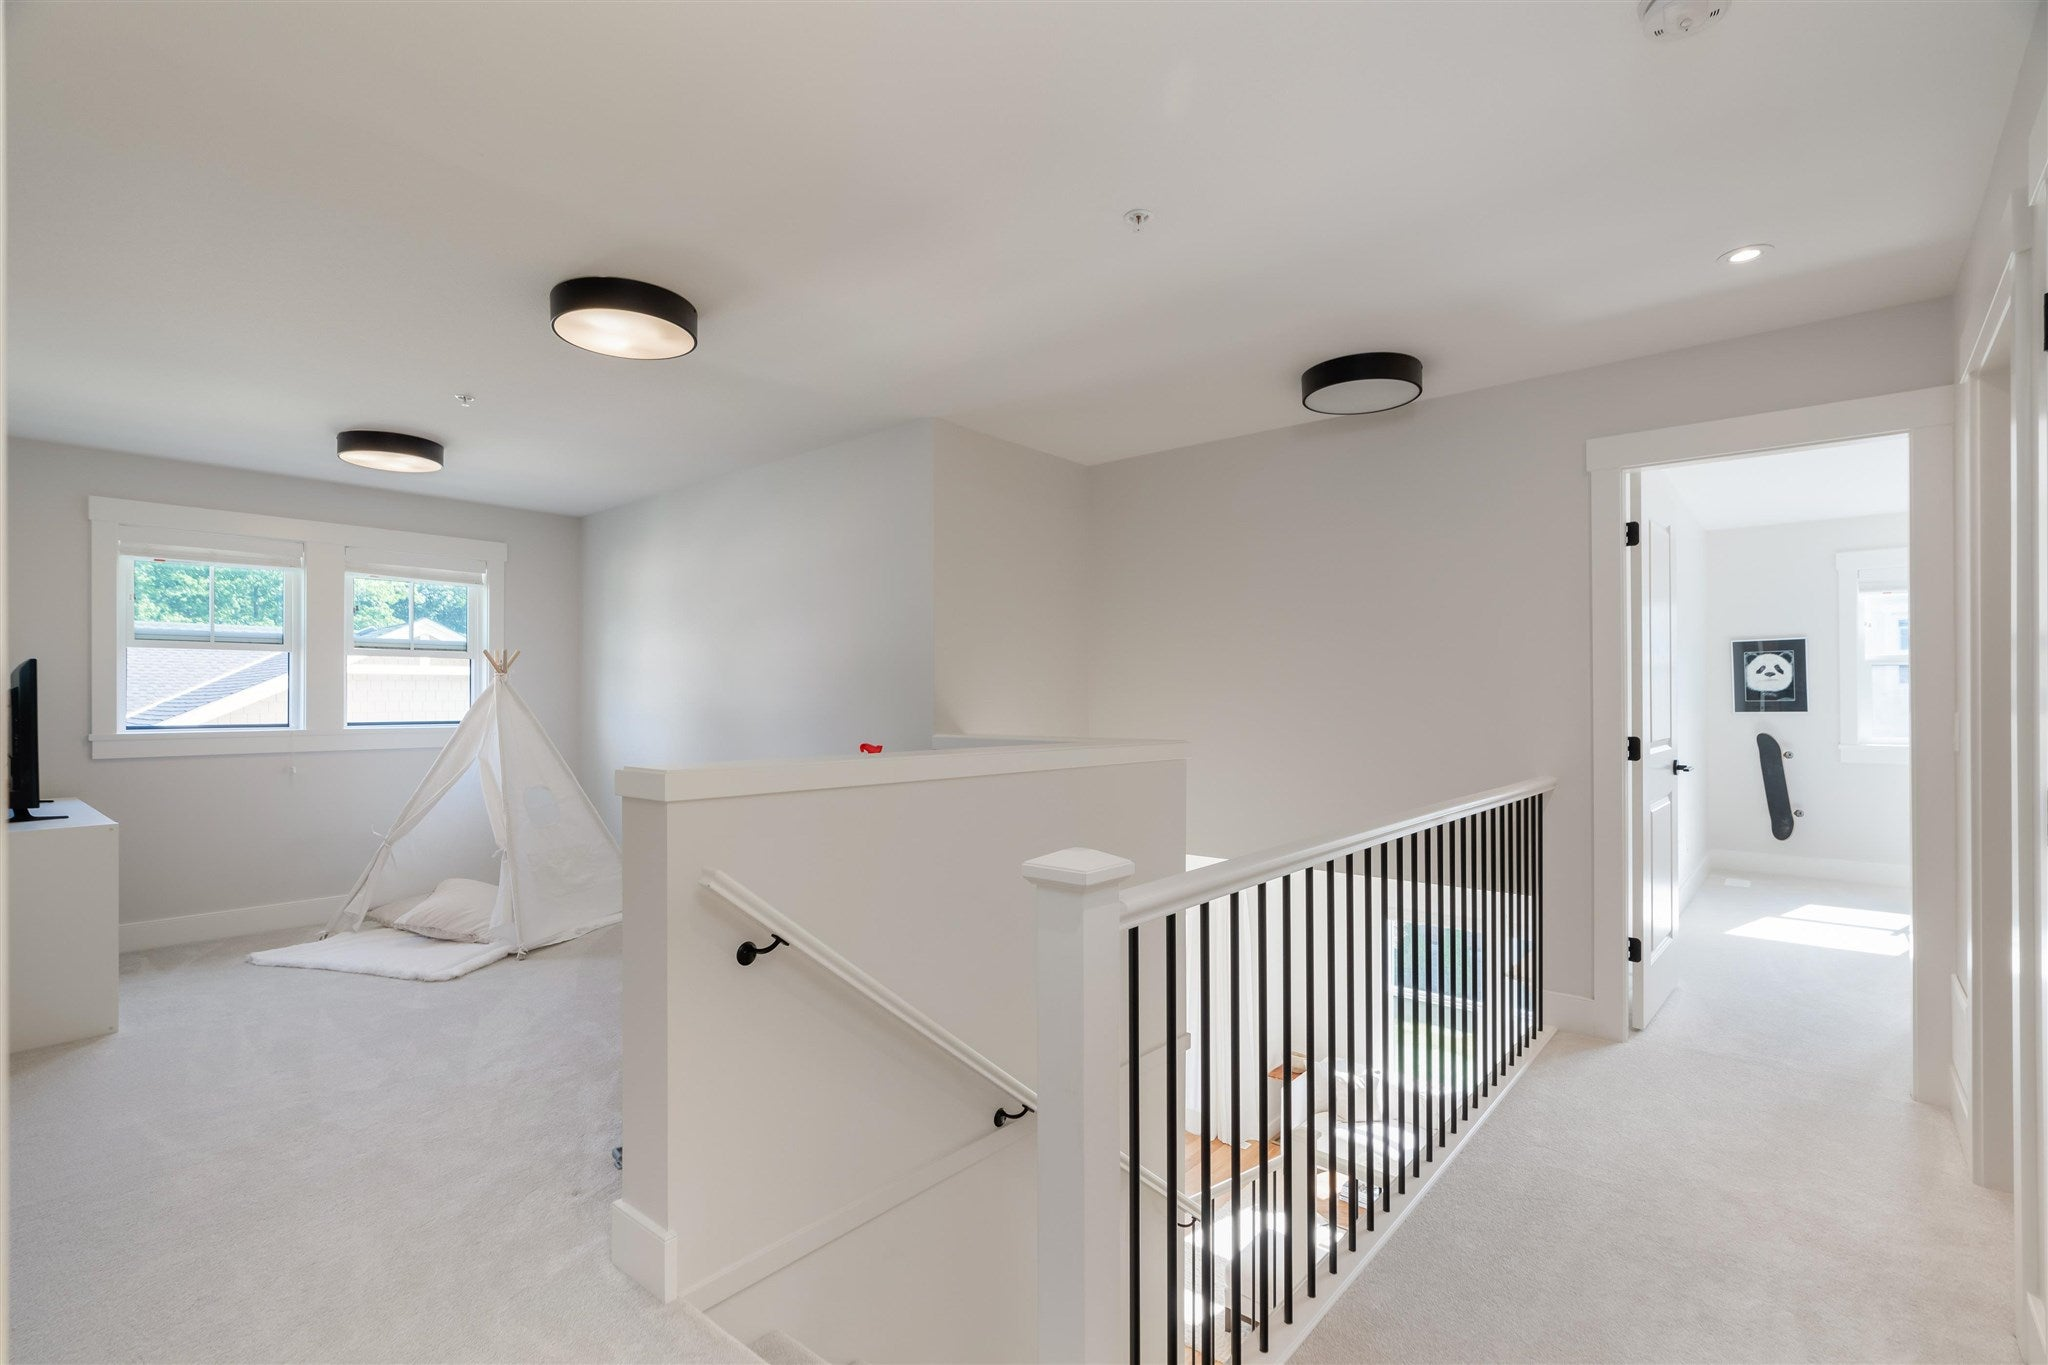 40 21858 47B AVENUE - Murrayville Townhouse for sale, 4 Bedrooms (R2603956) - #25